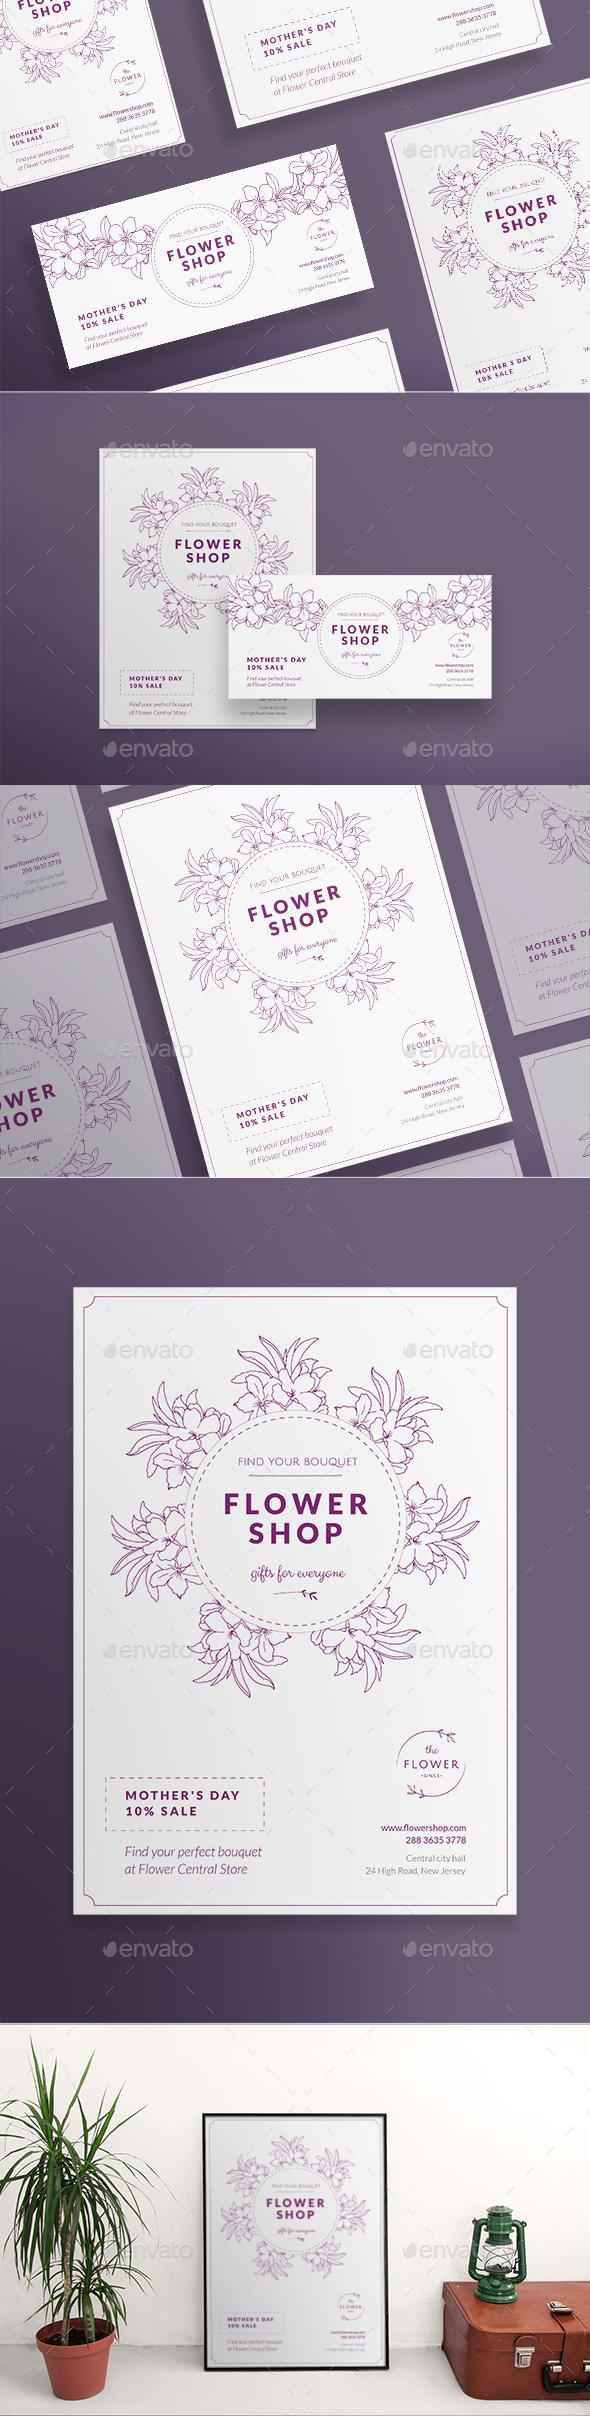 Flower Shop Flyers - Commerce Flyers